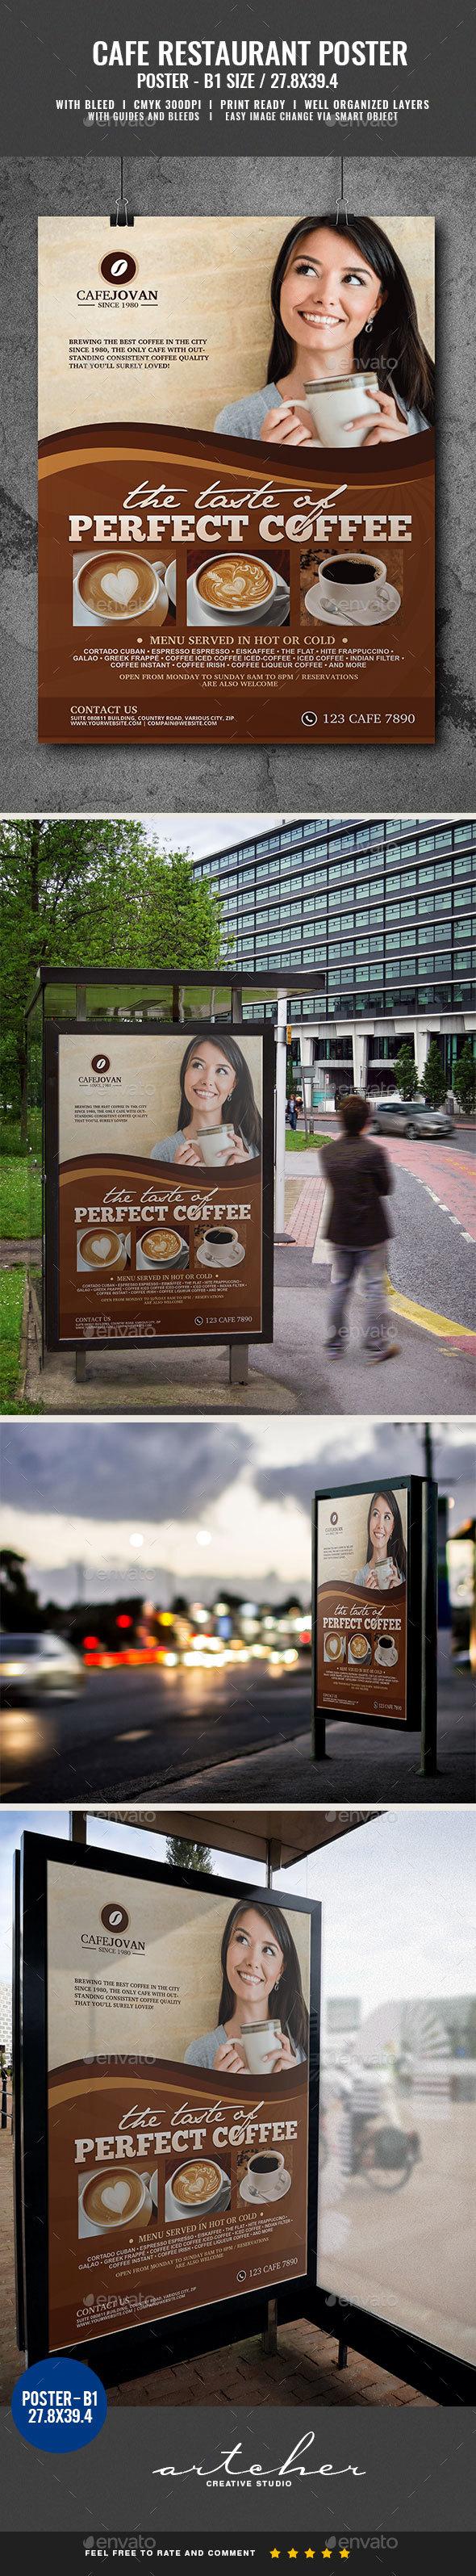 Cafe Restaurant Poster - Signage Print Templates